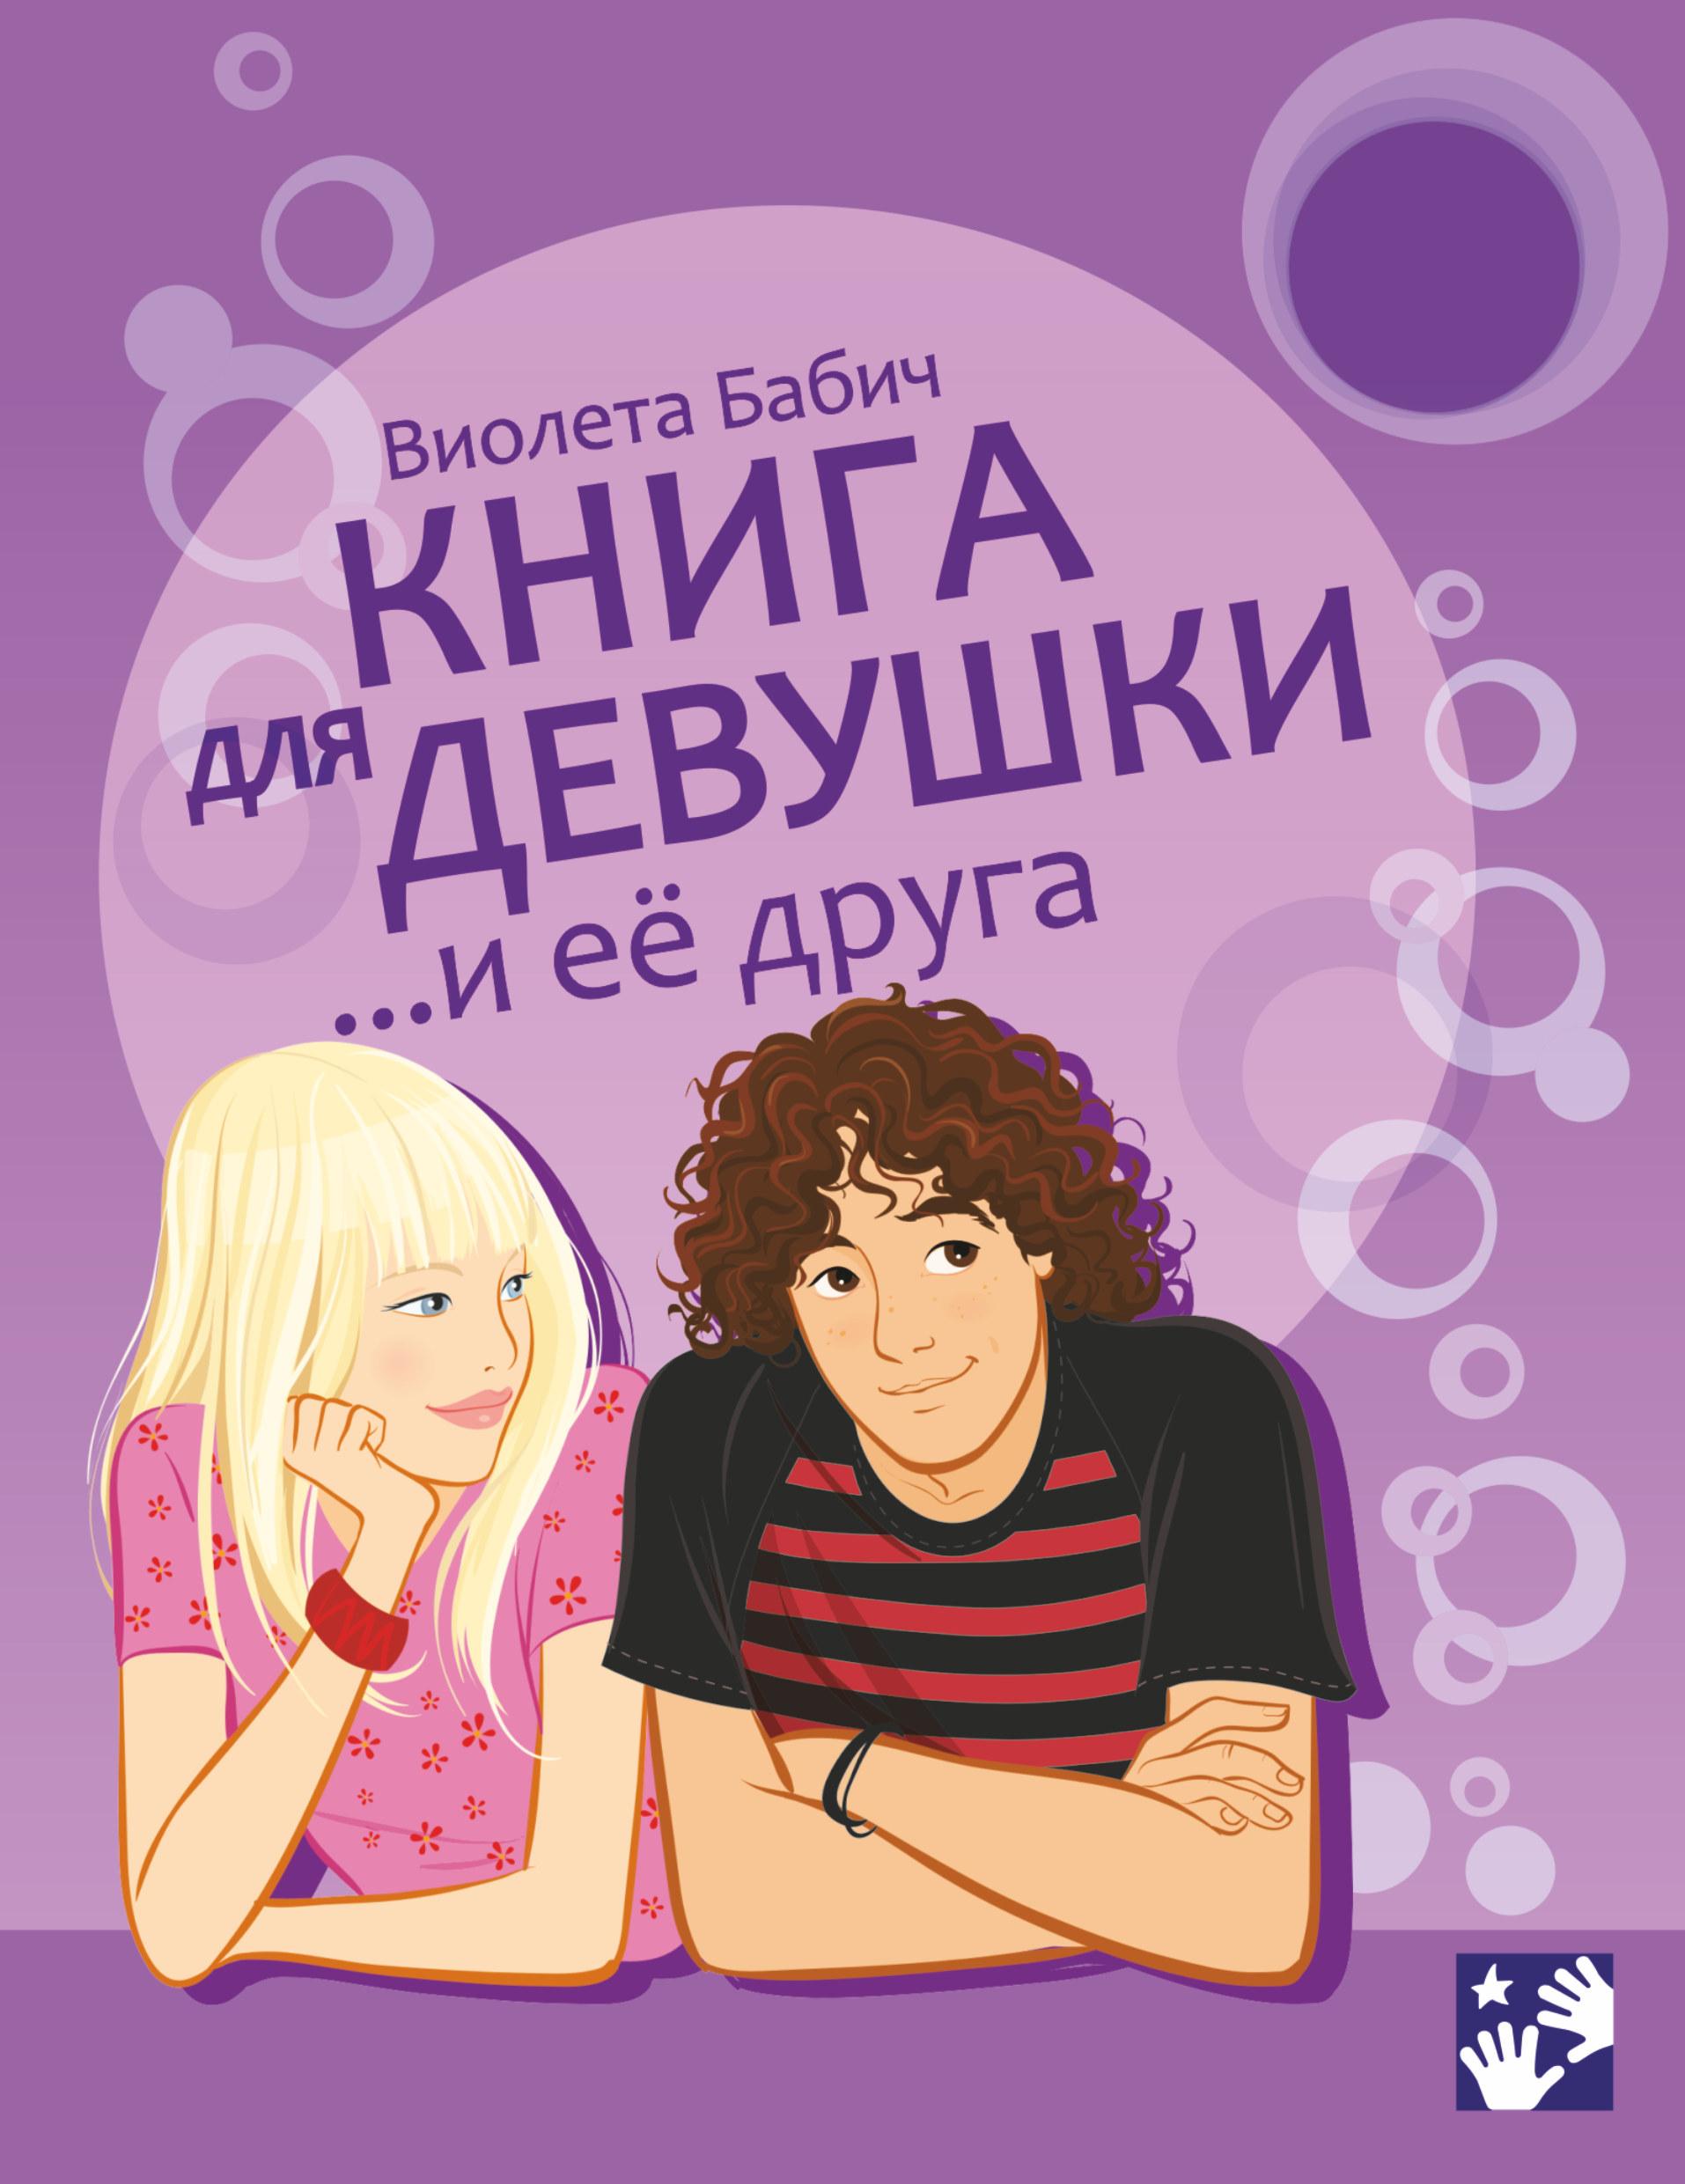 Книга для девушки и её друга от book24.ru